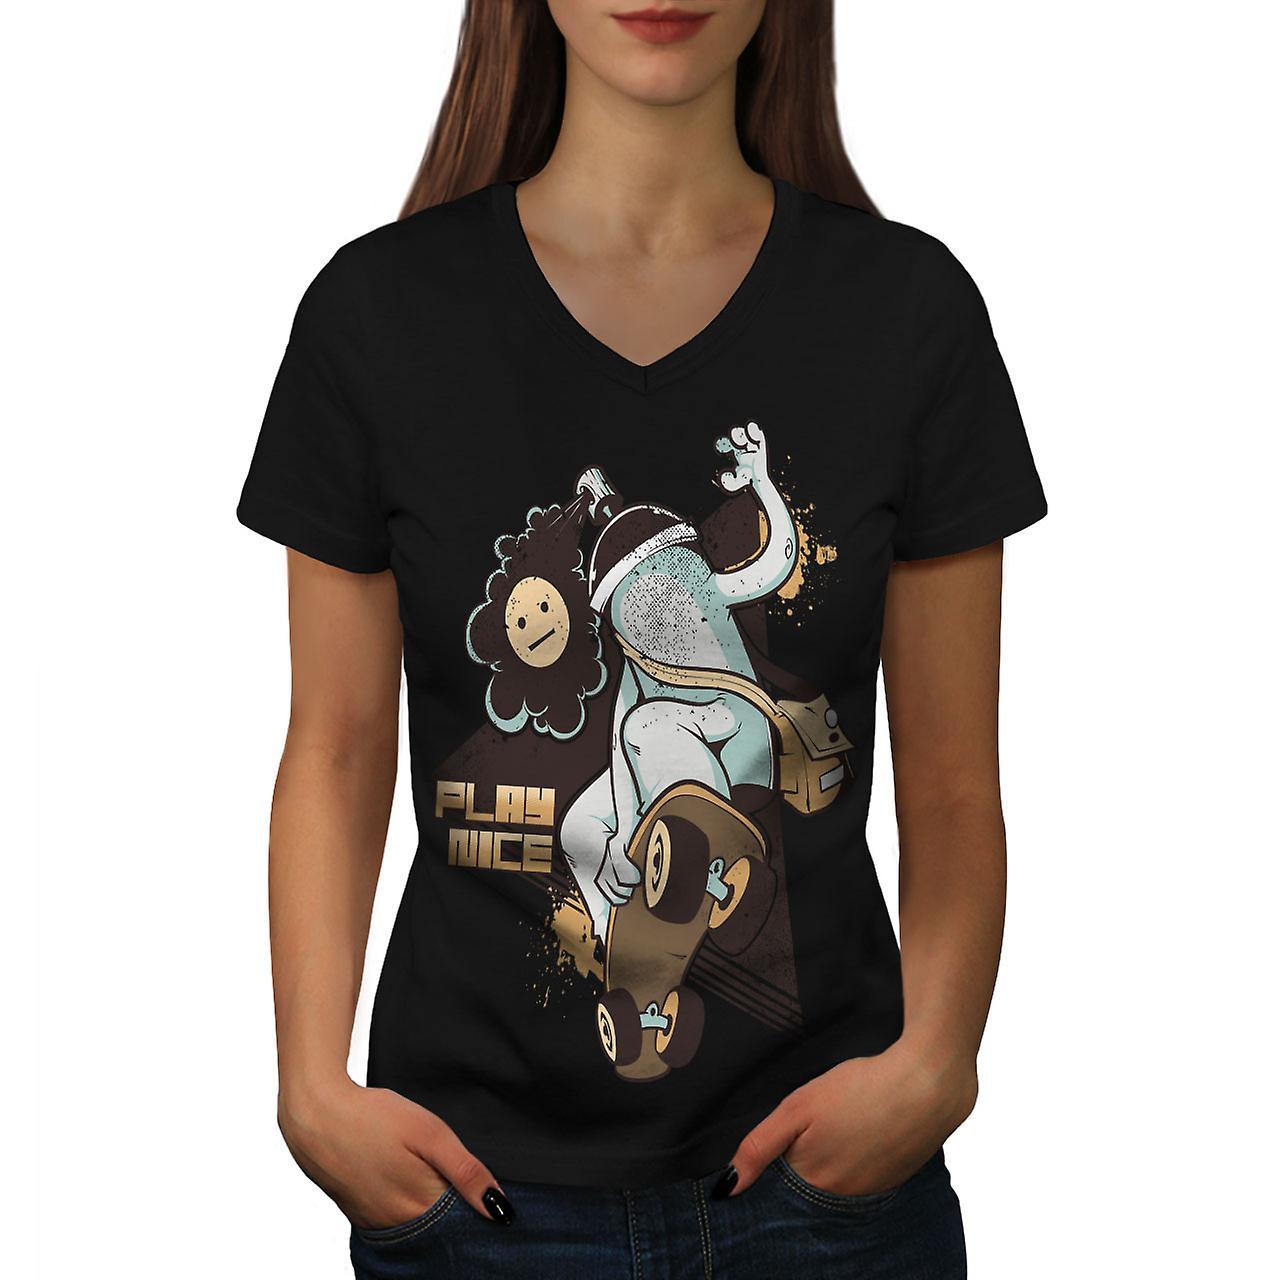 097705364c0f Spela fin Skate mode kvinnor BlackV-hals T-shirt | Wellcoda | Fruugo